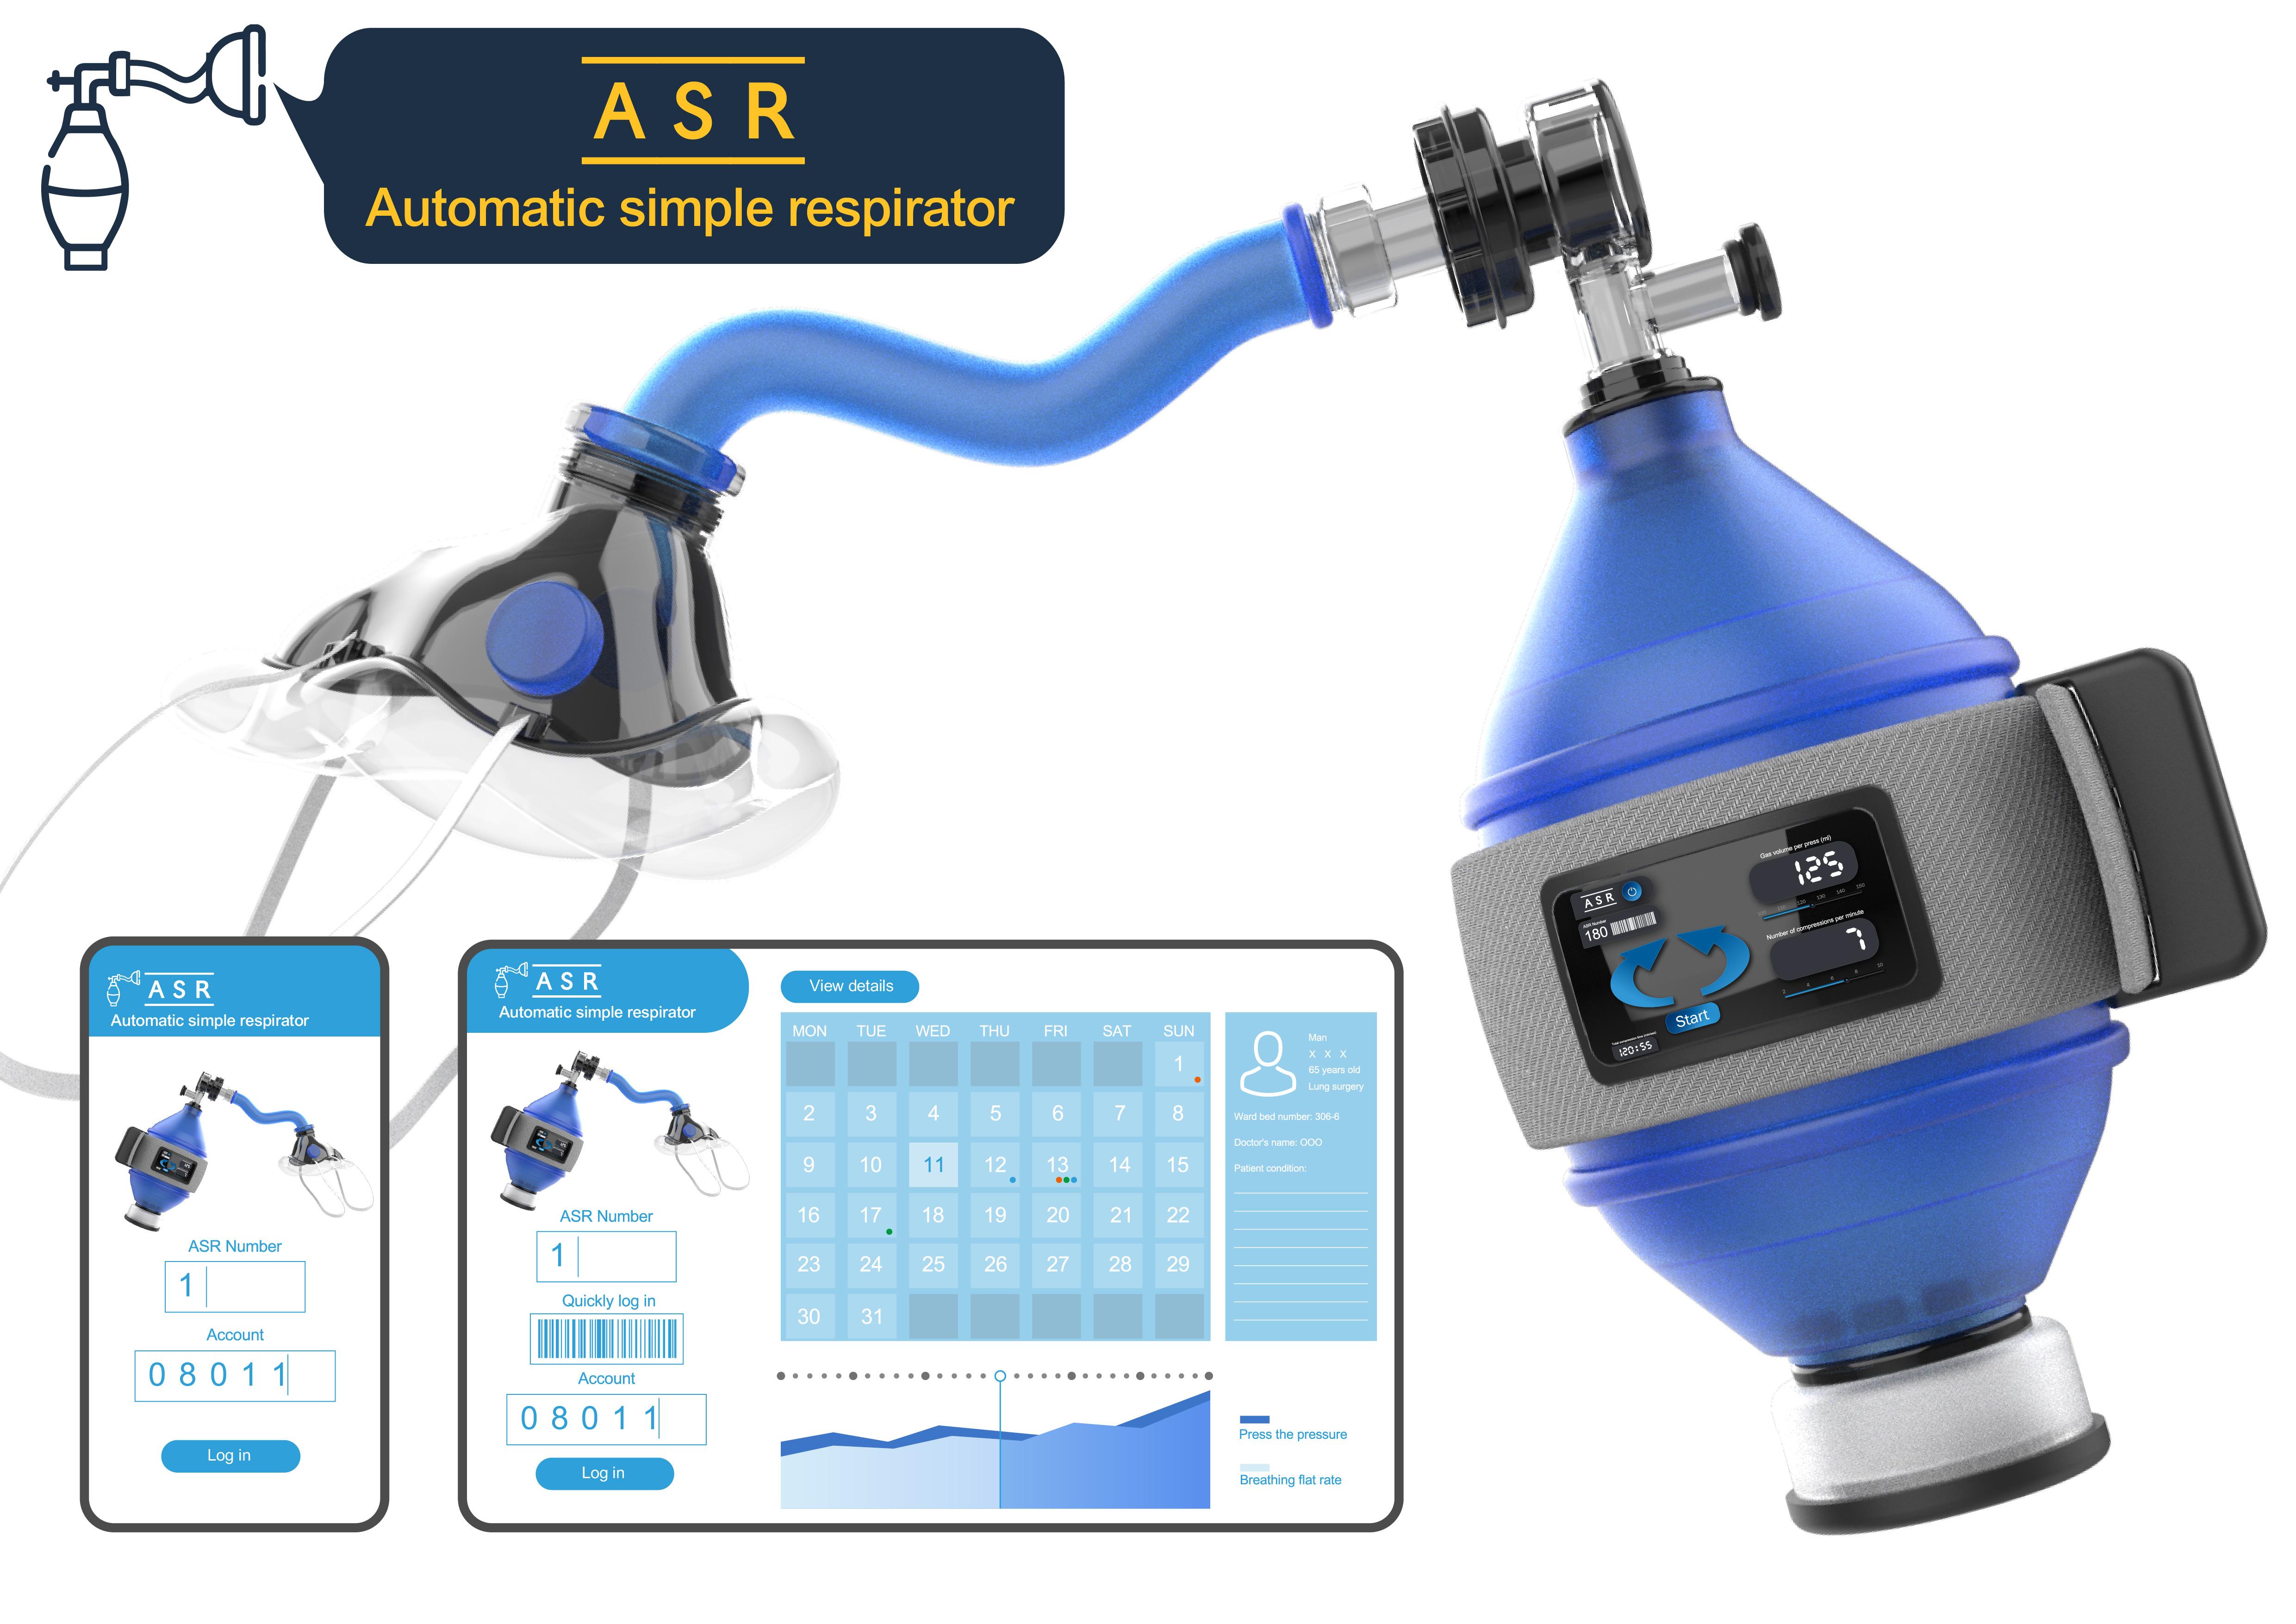 ASR-Automatic simple respirator